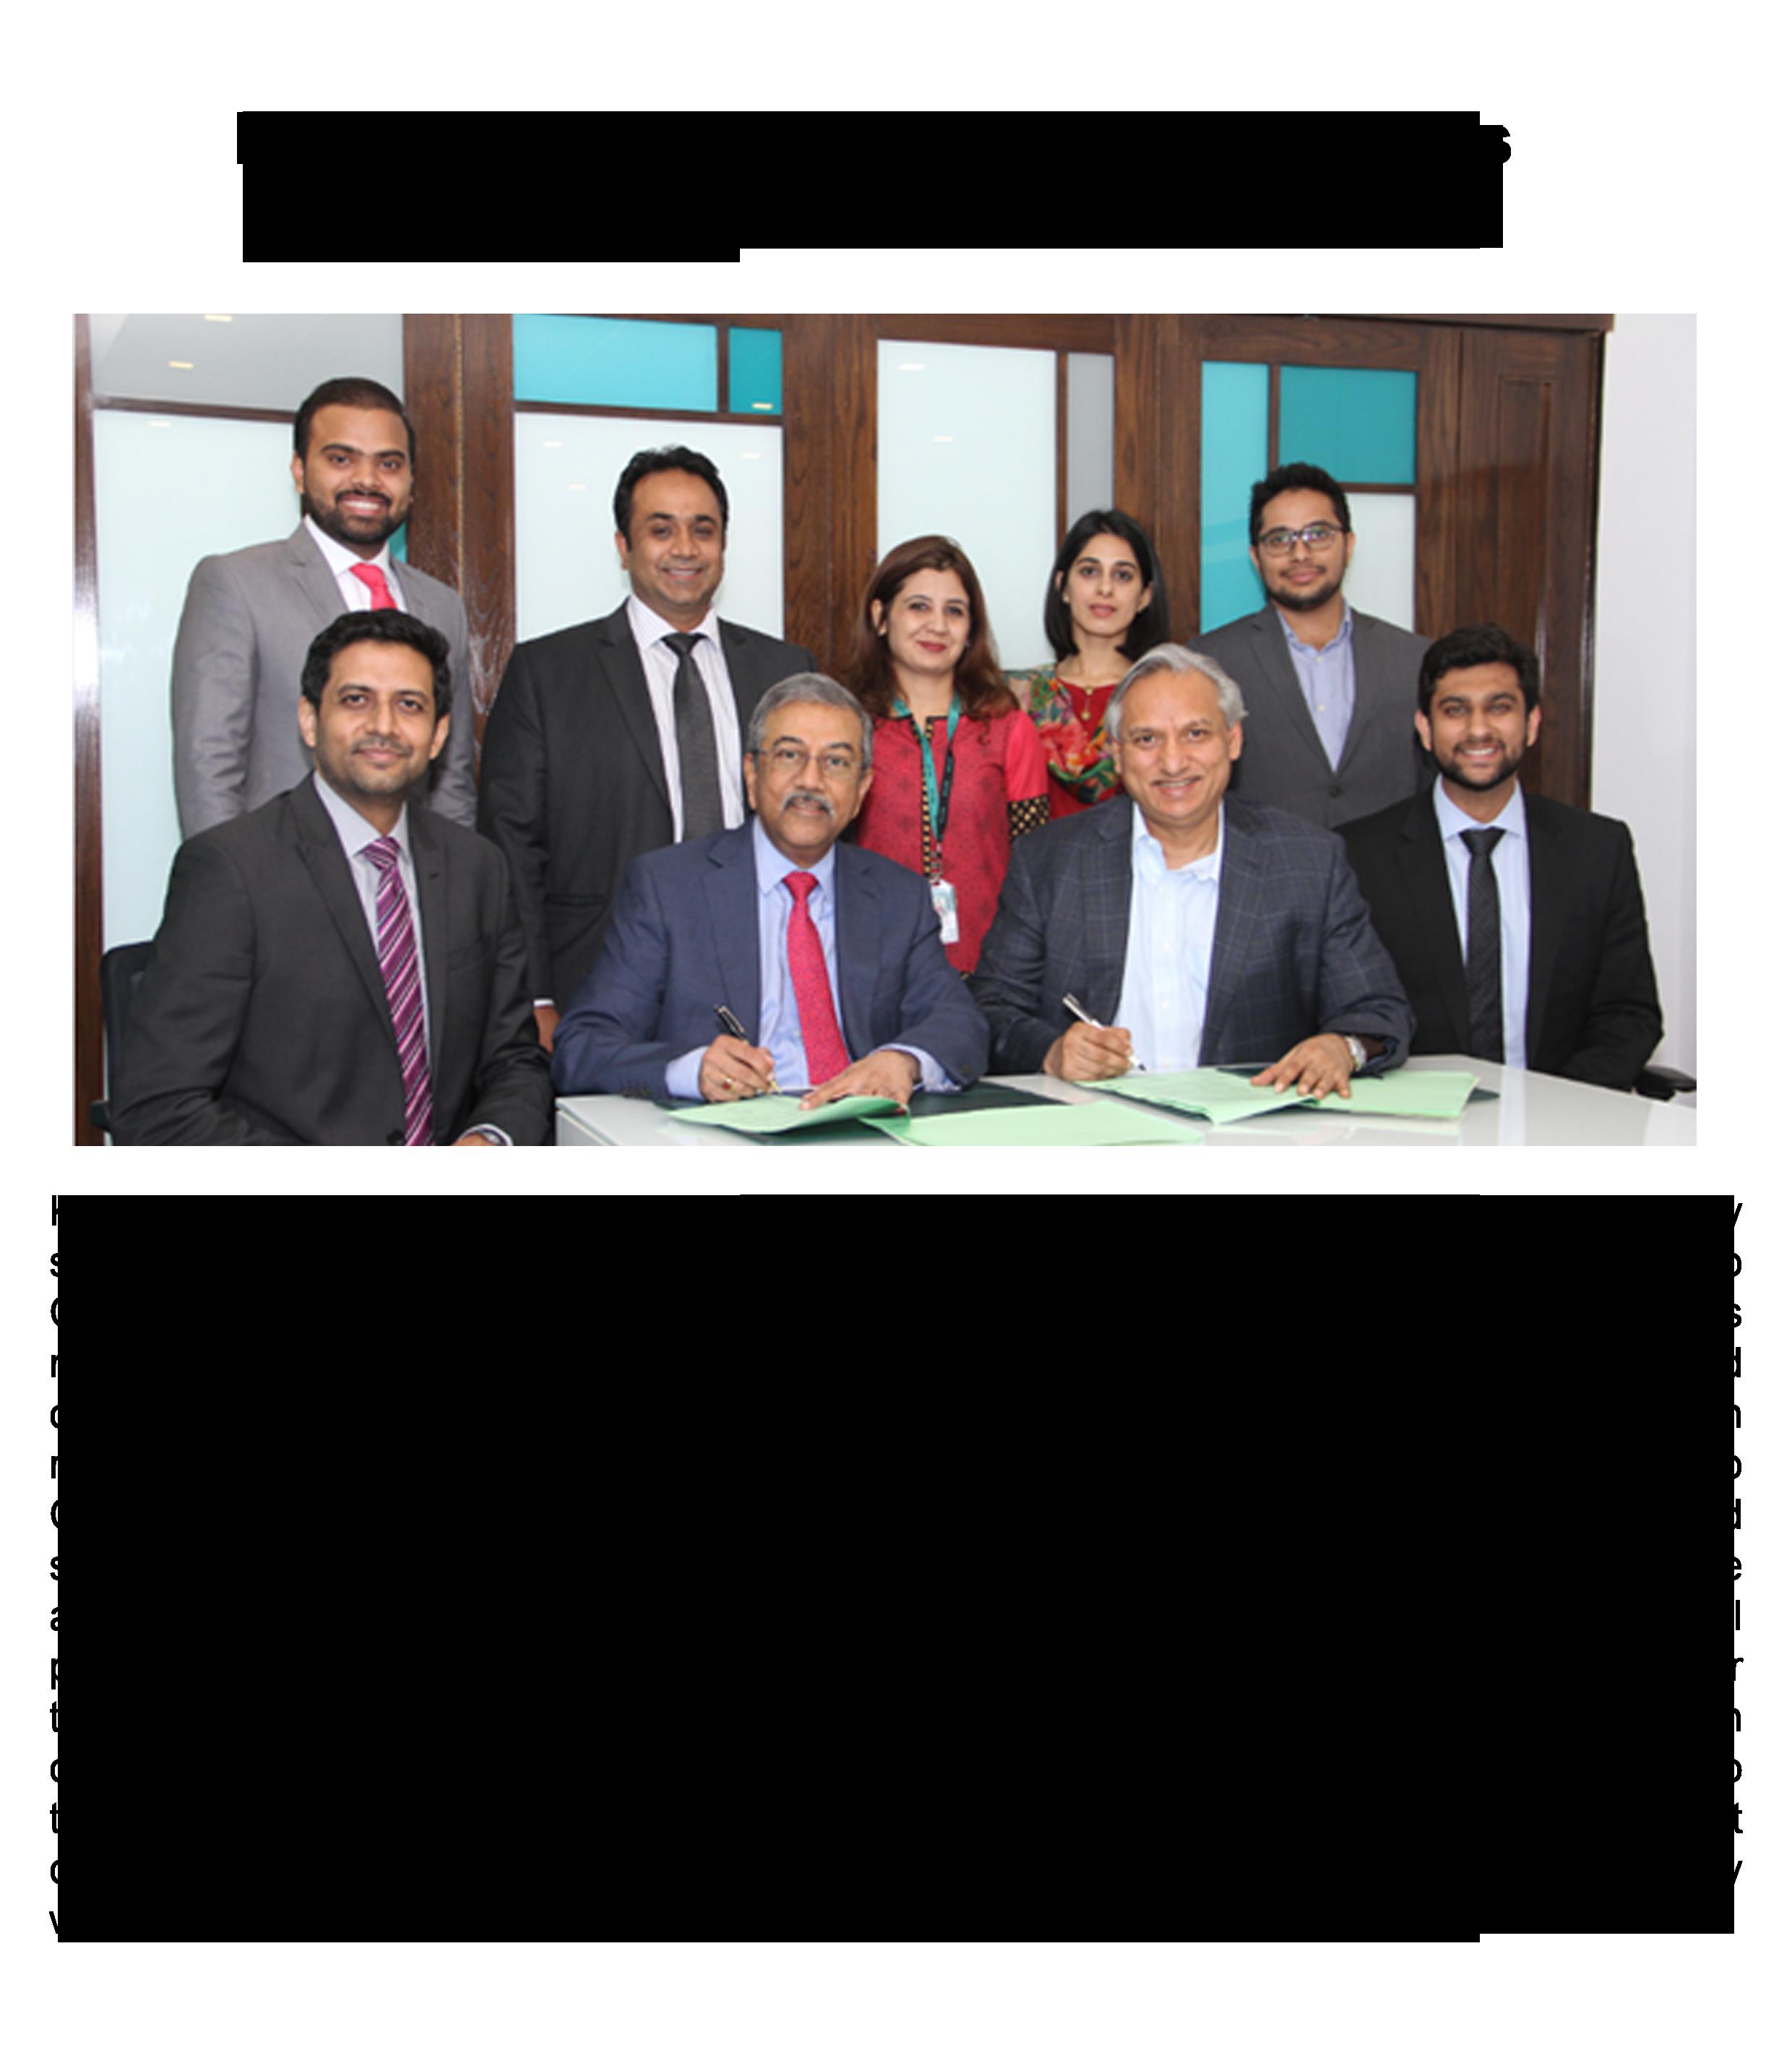 EFU Life – Tez Financial Services Strategic Partnership